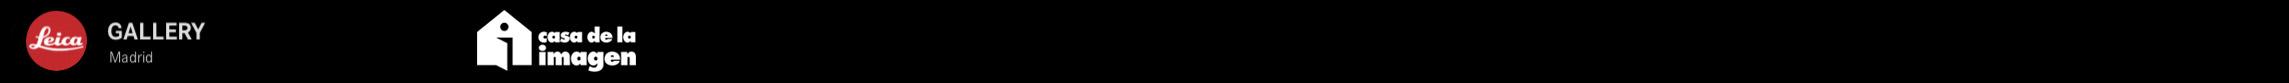 logos-negro-2